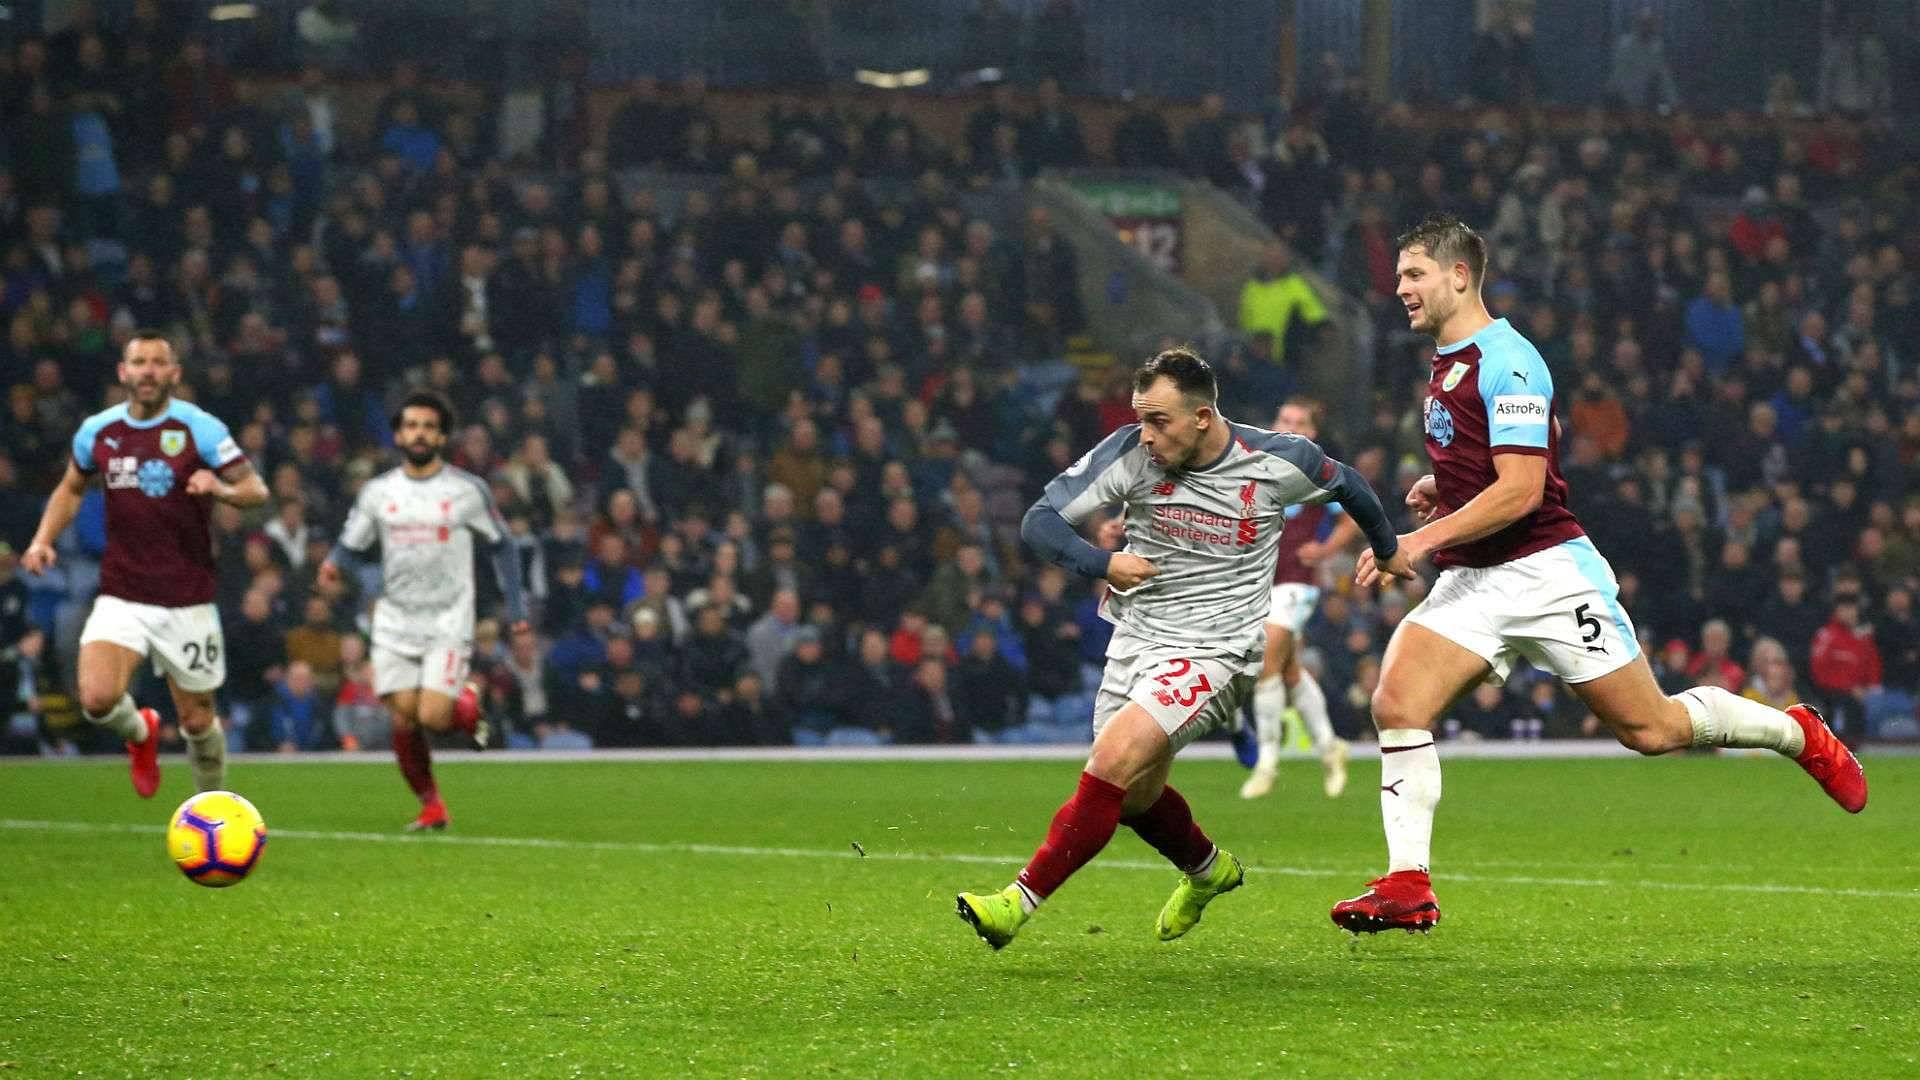 Liverpool Lineup Vs Burnley: Burnley Vs Liverpool Lineup for Premier League Gameweek 4 match